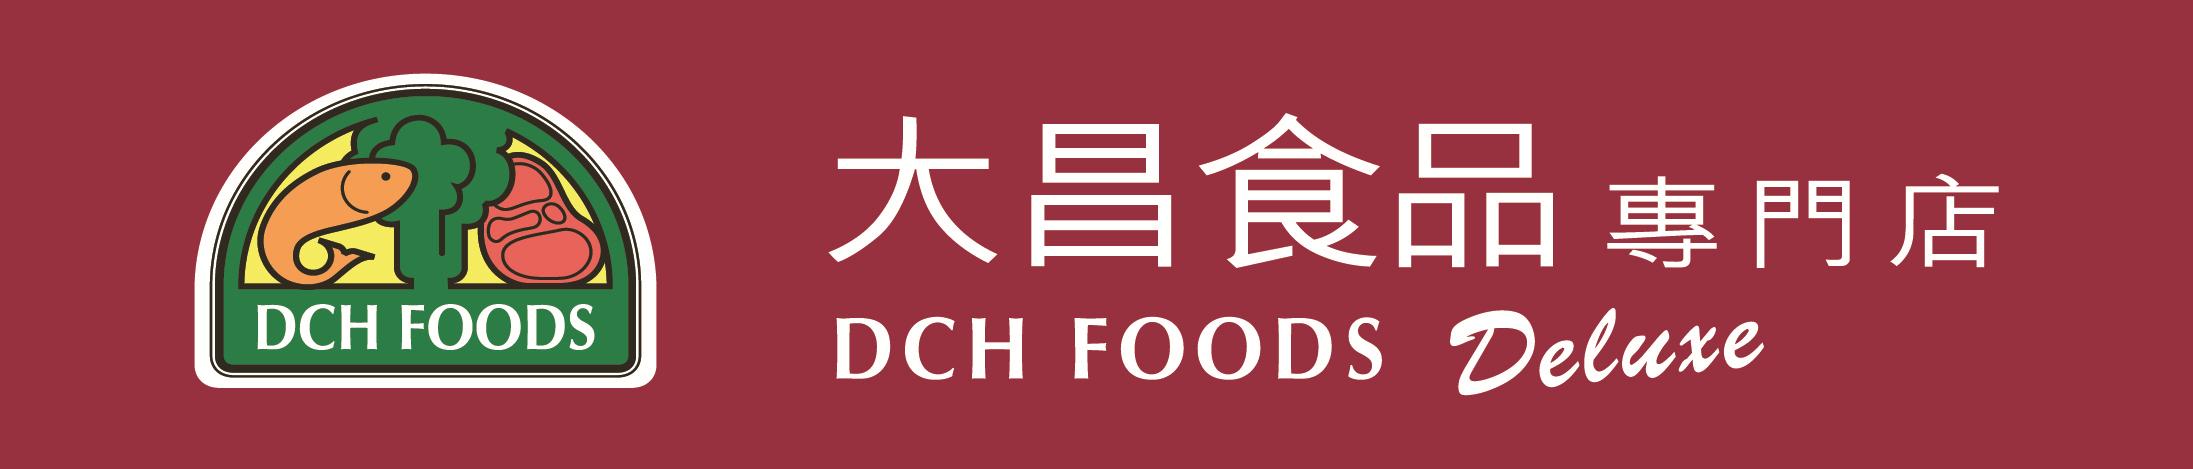 food scheme 2020 gold DCH FoodMart